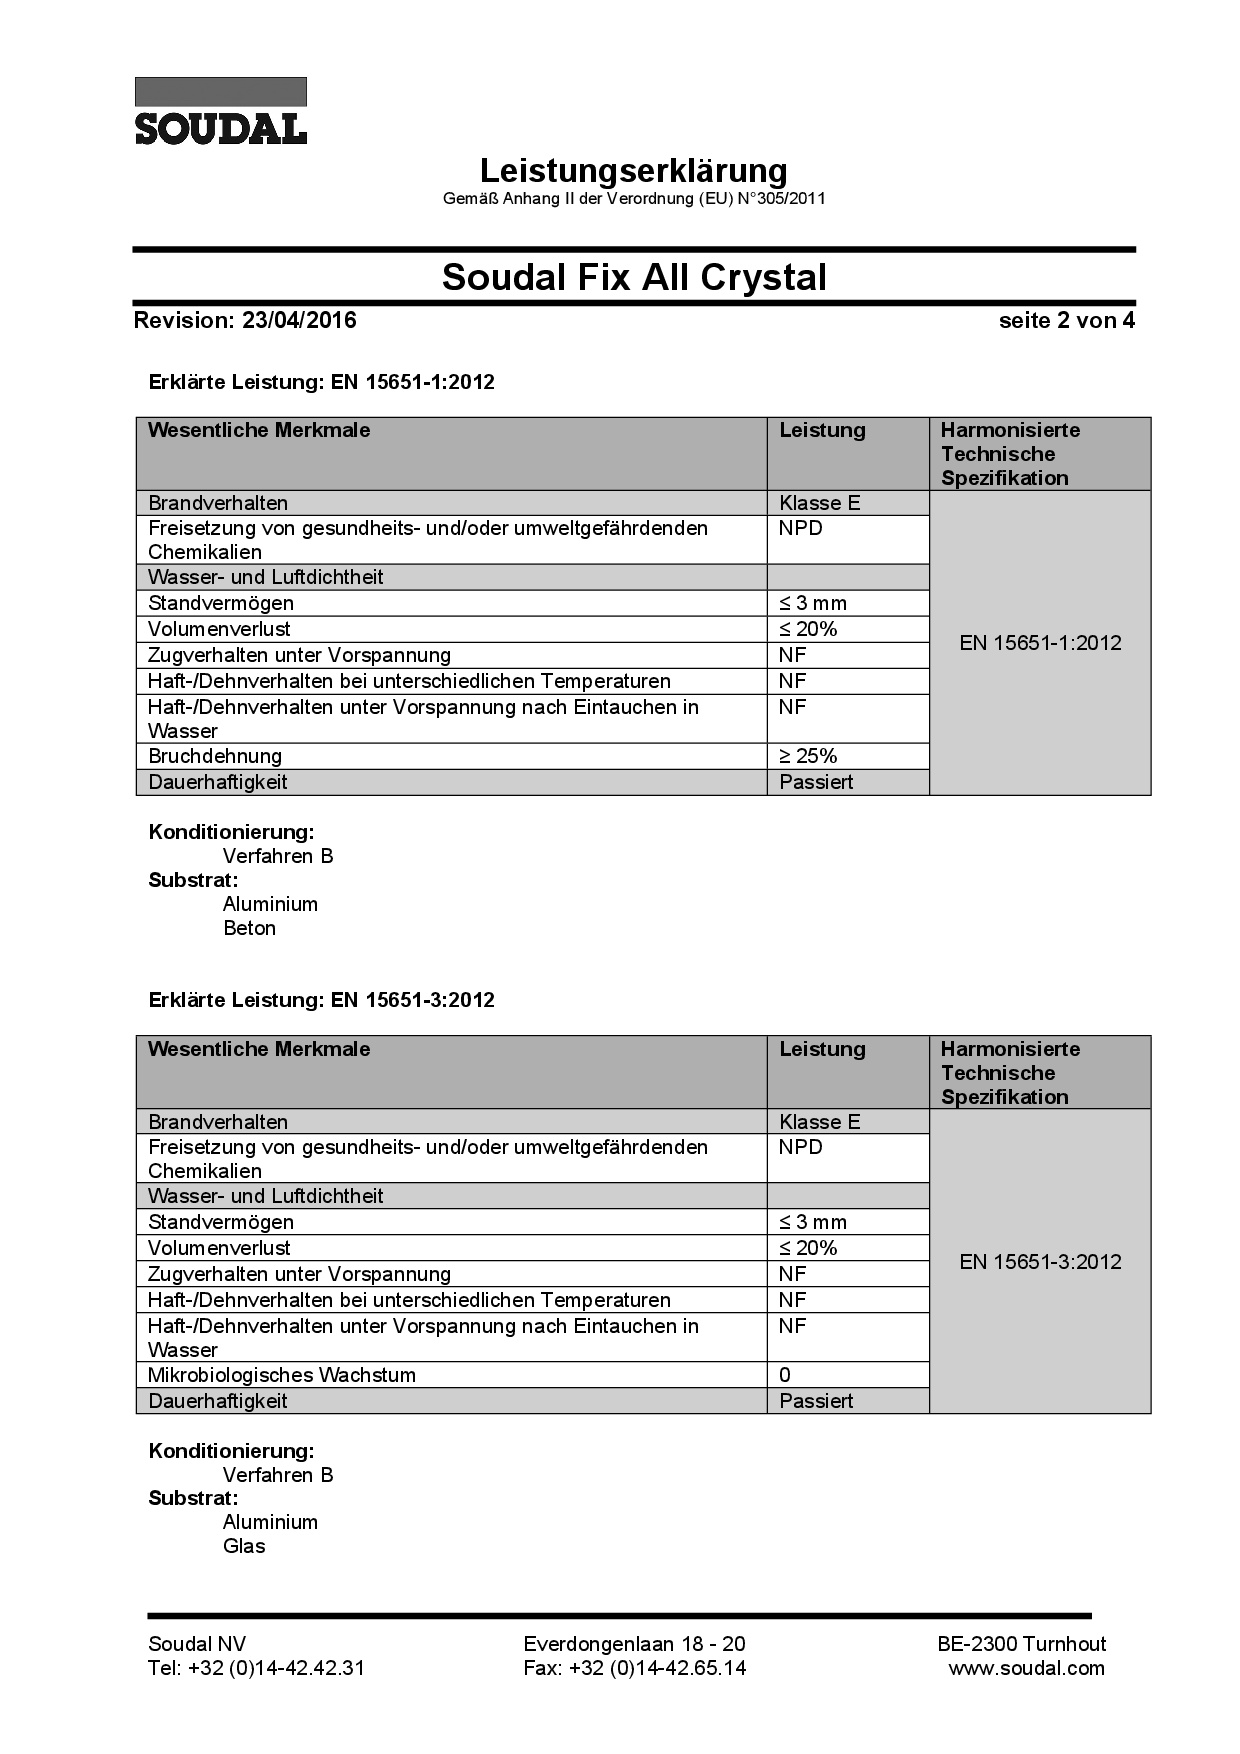 Soudal-Crystal-DOP-jpg-0023rrdxqXlPb8Nt